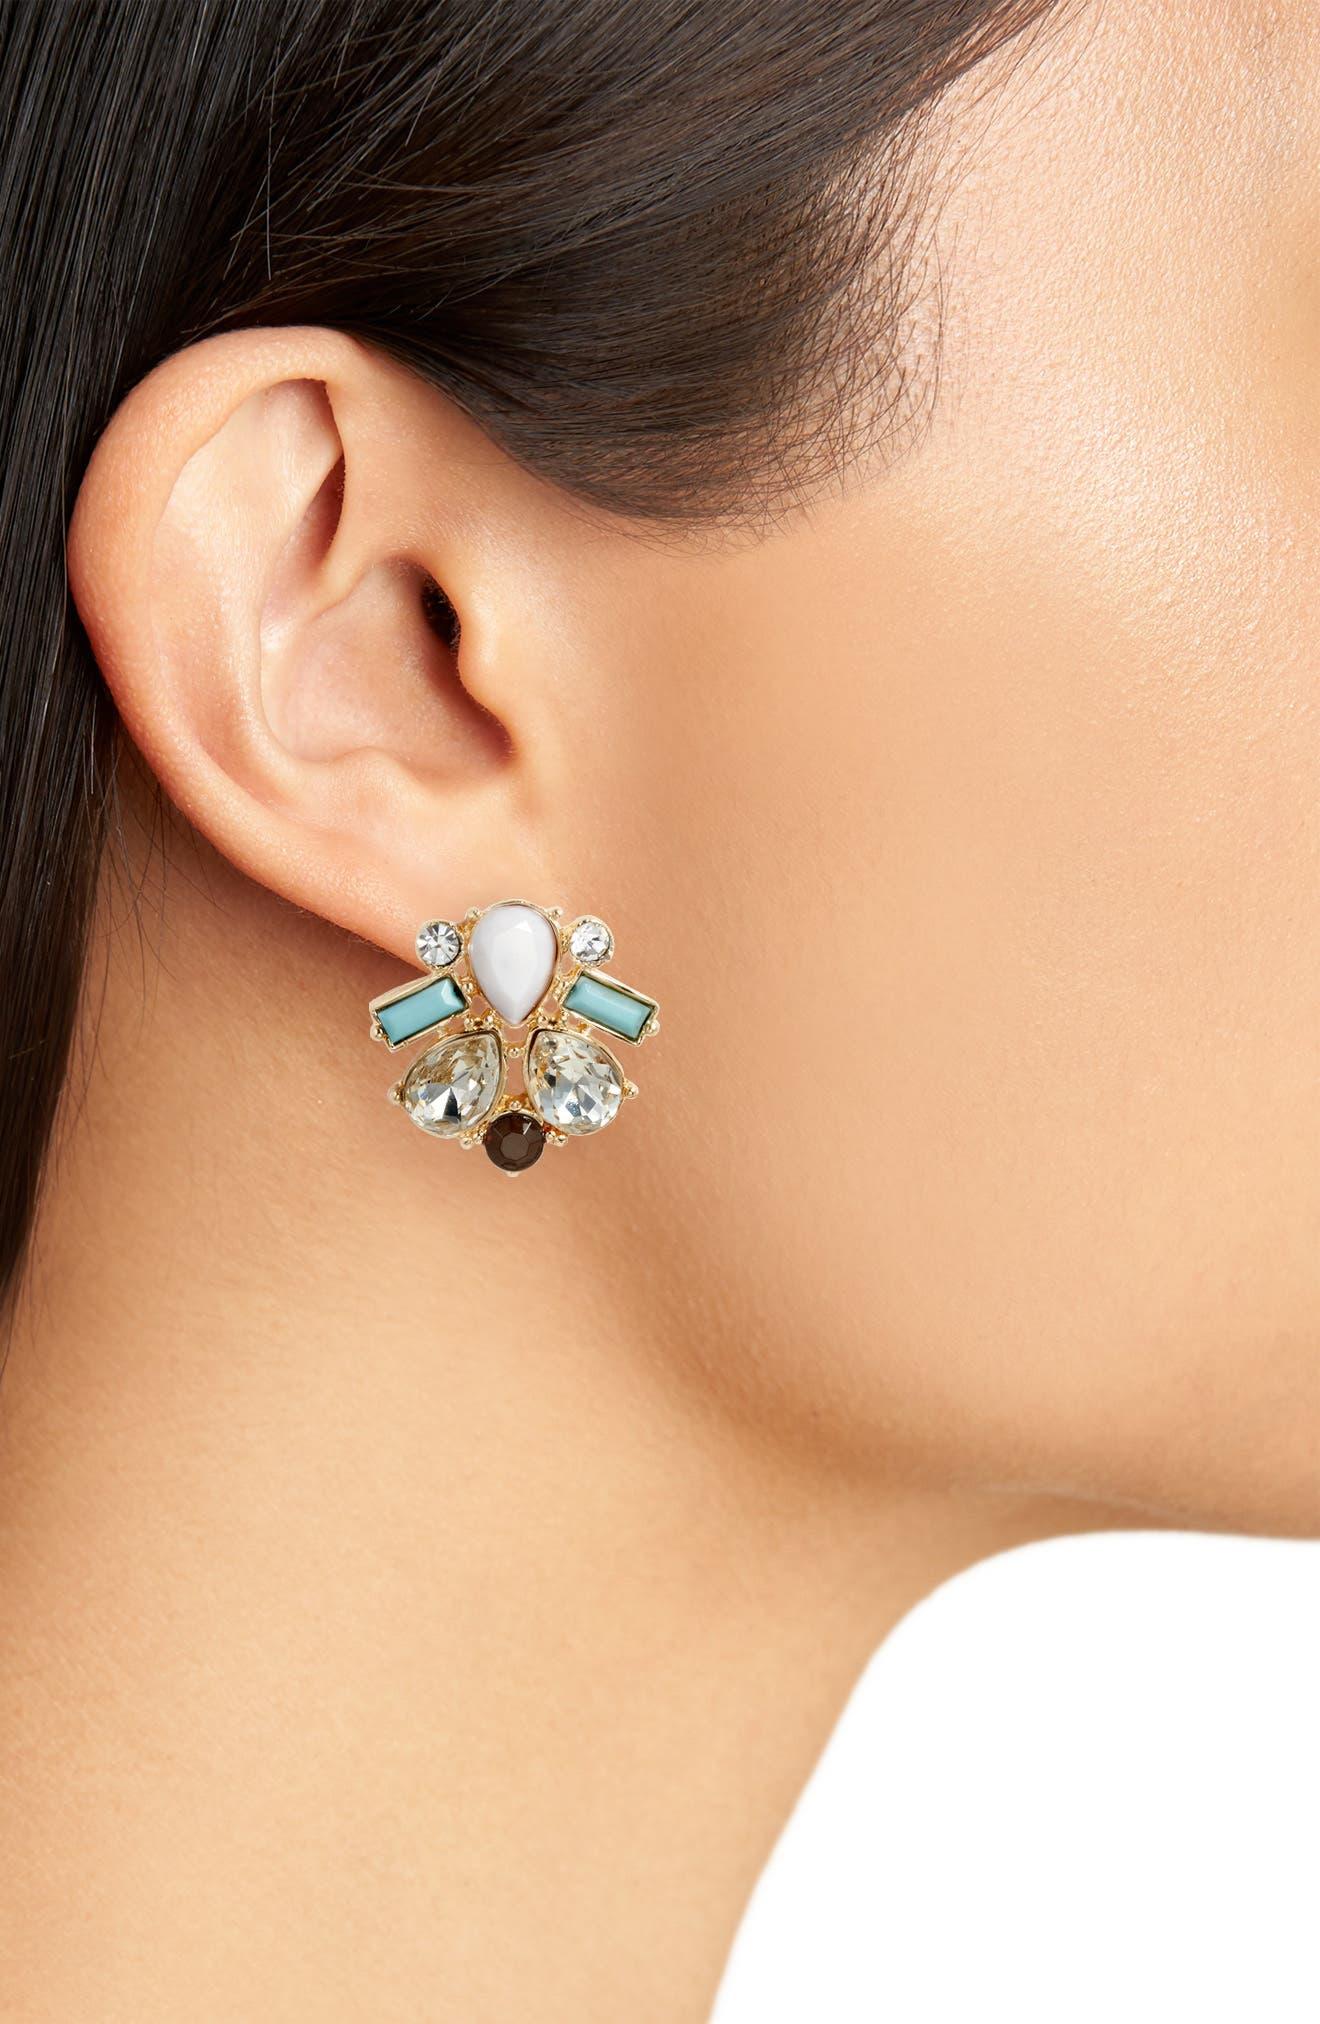 Crystal & Stone Stud Earrings,                             Alternate thumbnail 2, color,                             White/ Mint/ Gold